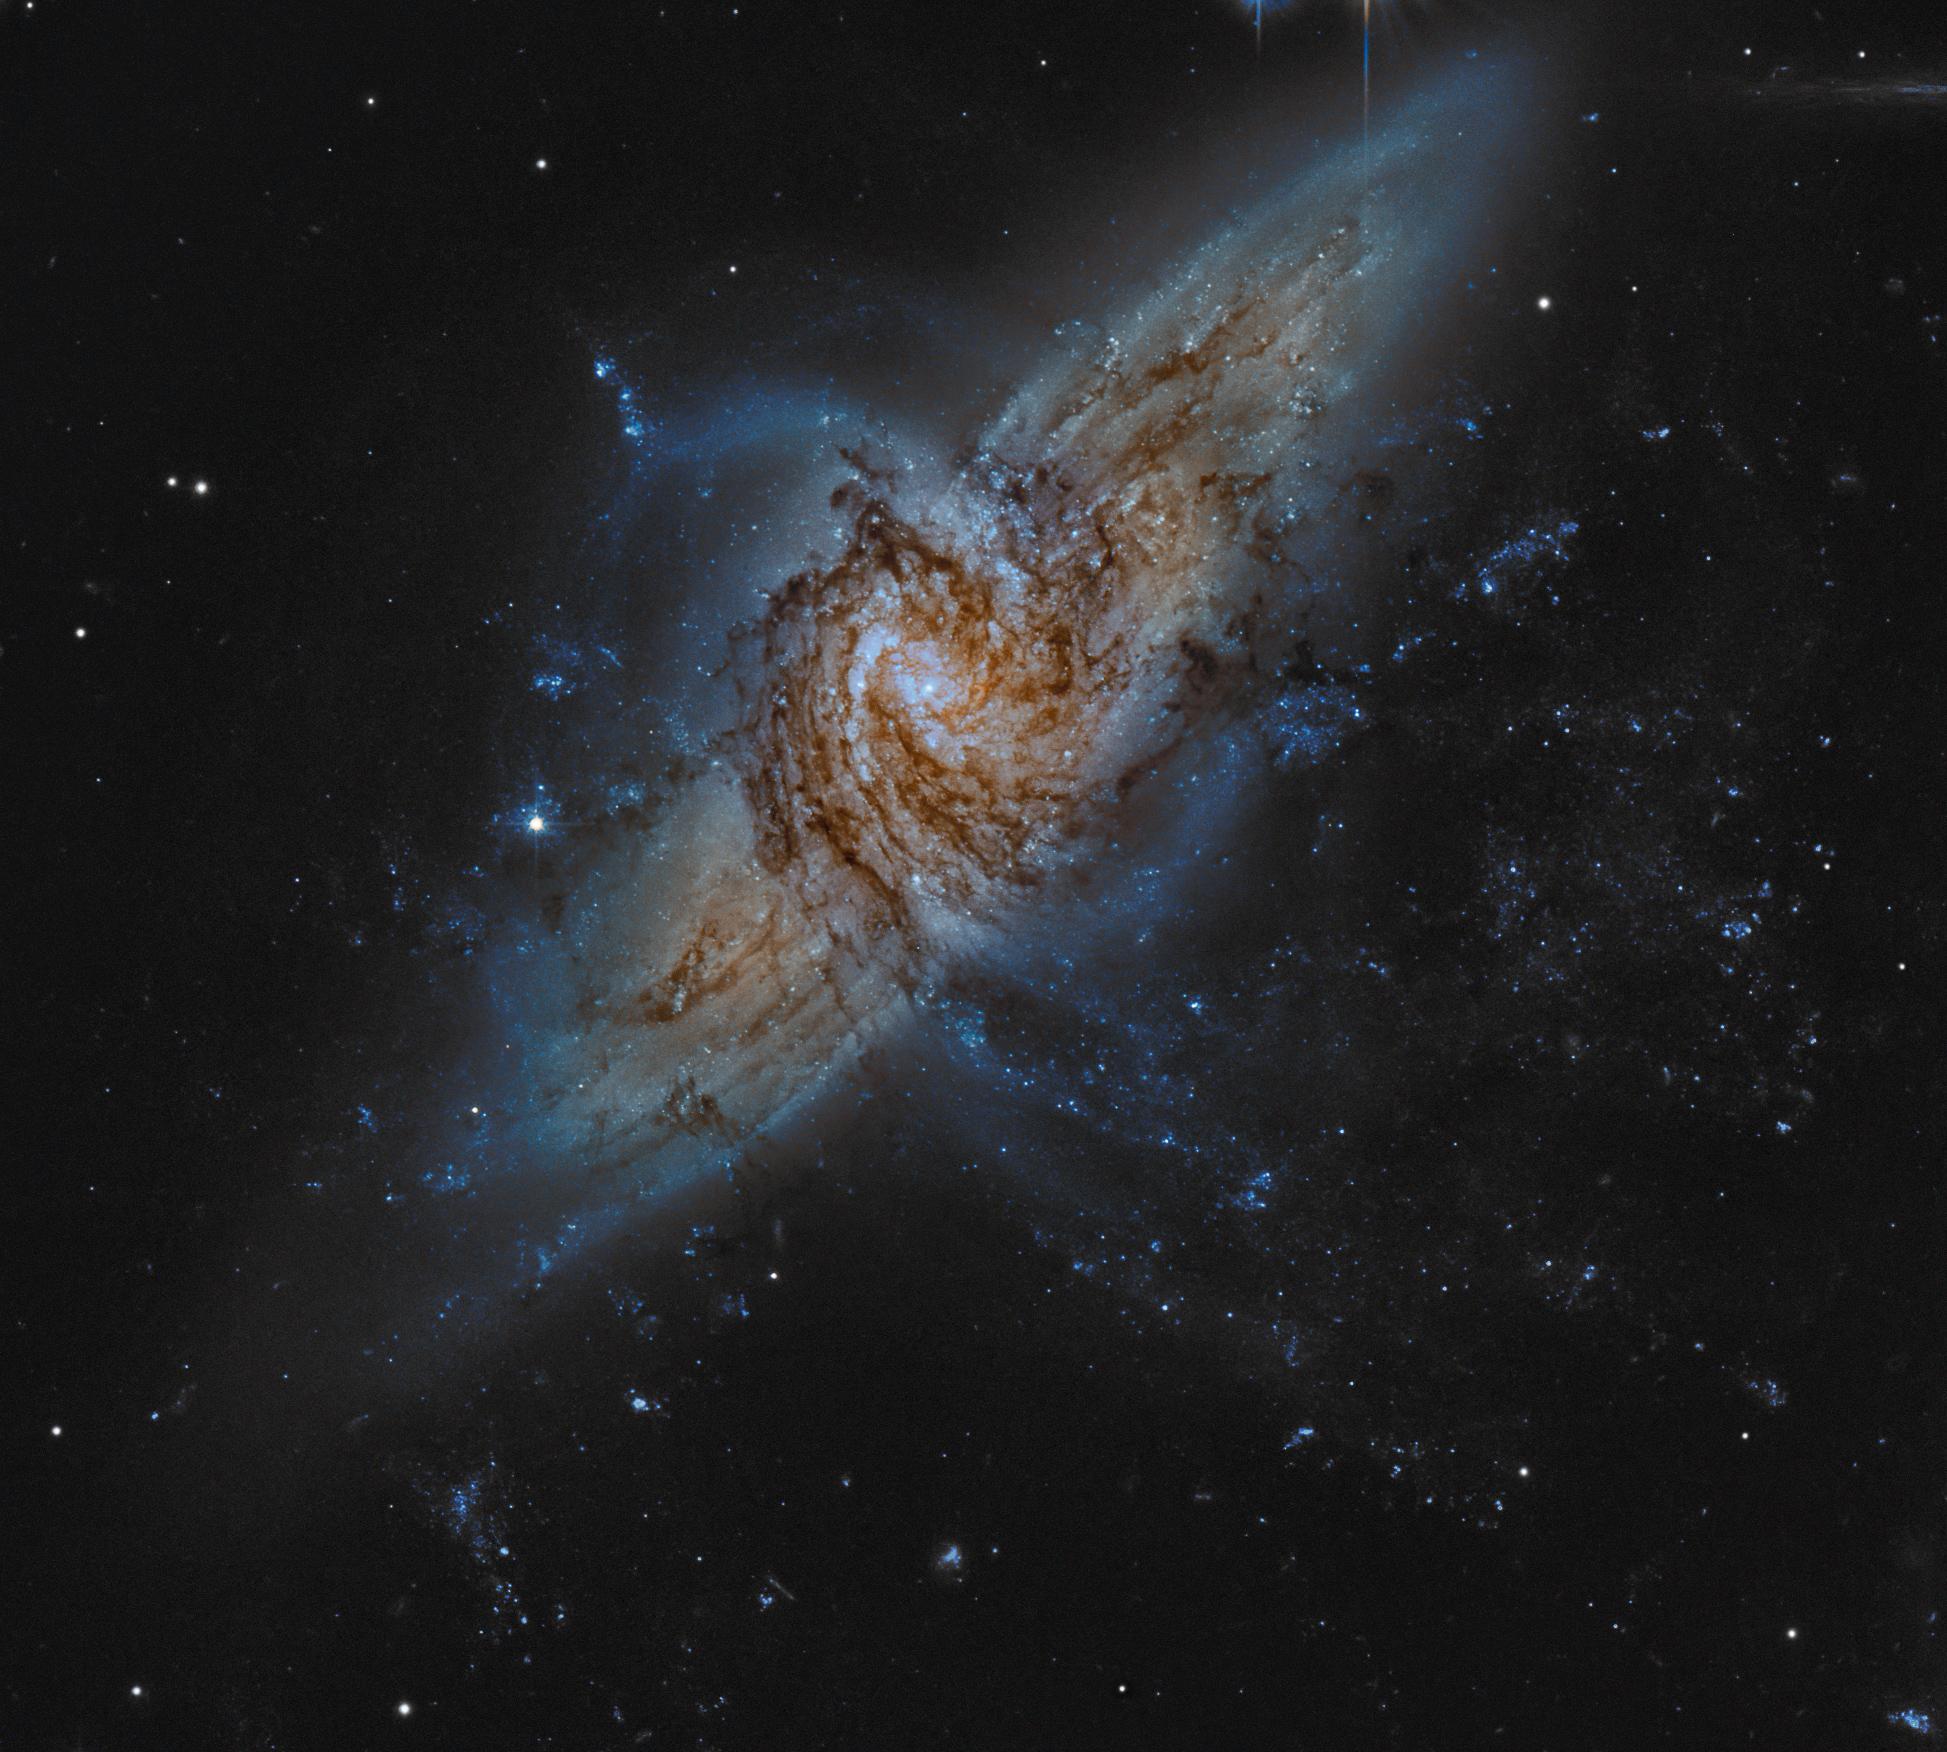 Image Credit: Hubble Legacy Archive, ESA, NASA (Processing - Martin Pugh)